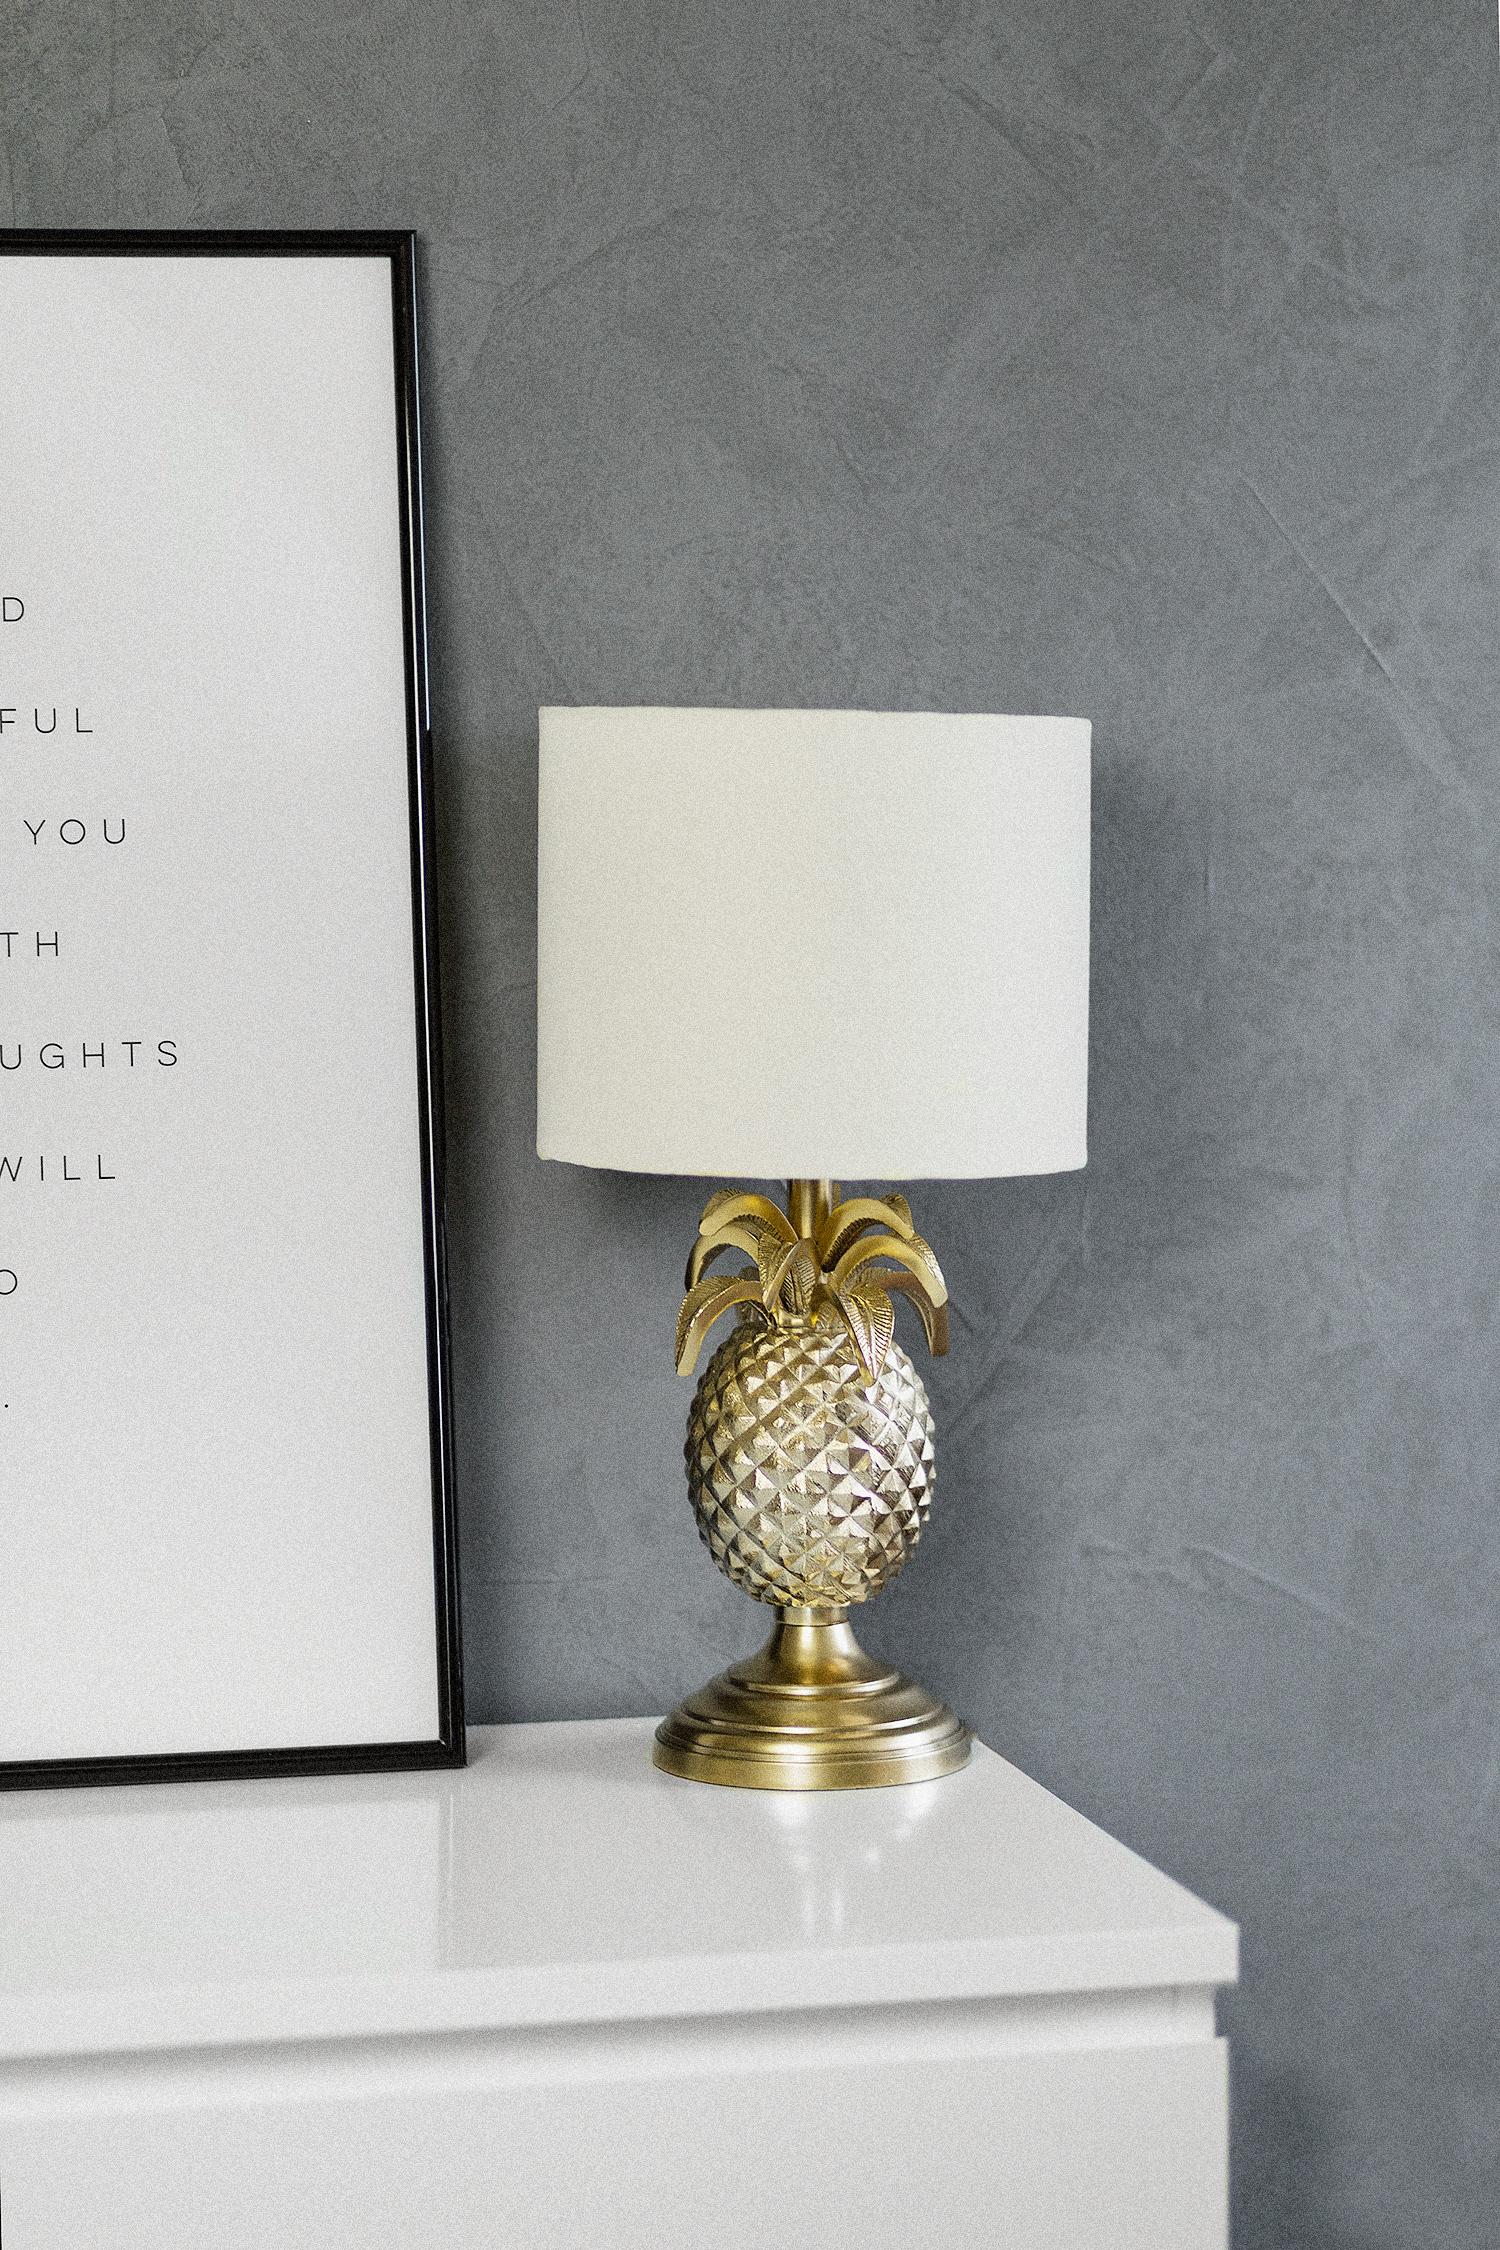 Oktober Favoriten 2017, Monatsrückblick, Pineapple Lampe von Miraluz, Westwing, goldene Ananas Lampe, bezauberndenana.de